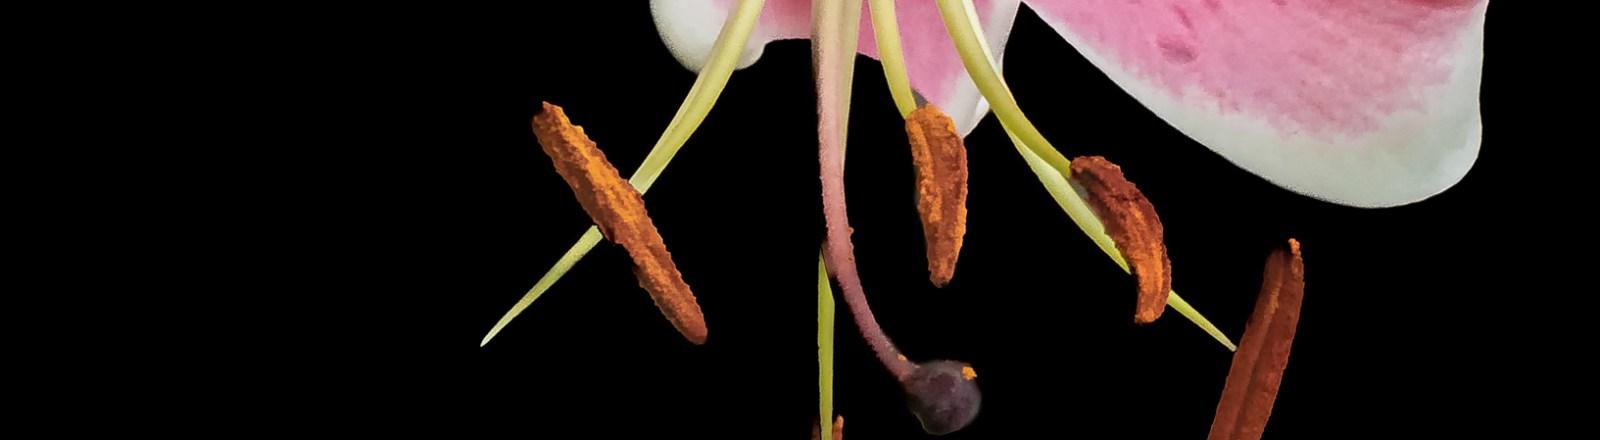 Summer 2020: Lily Variations (10 of 10)